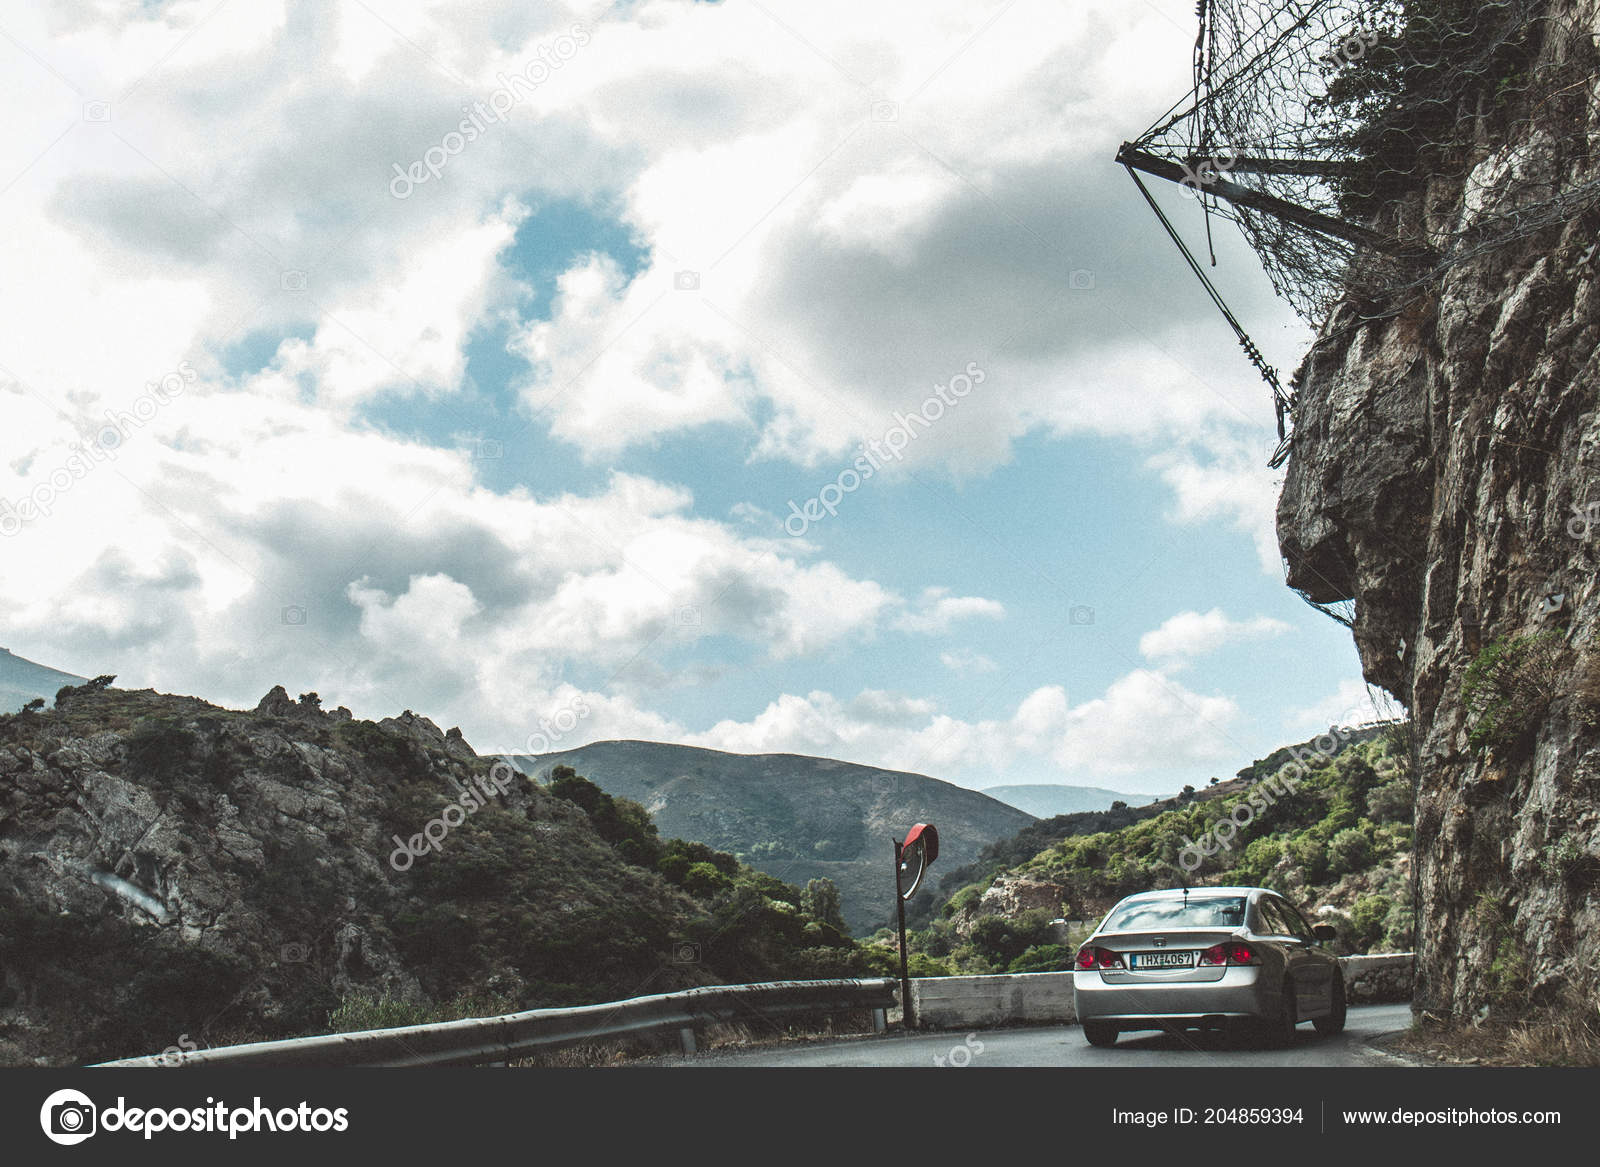 October 2Nd 2017 Topolia Greece Dangerous Mountain Road